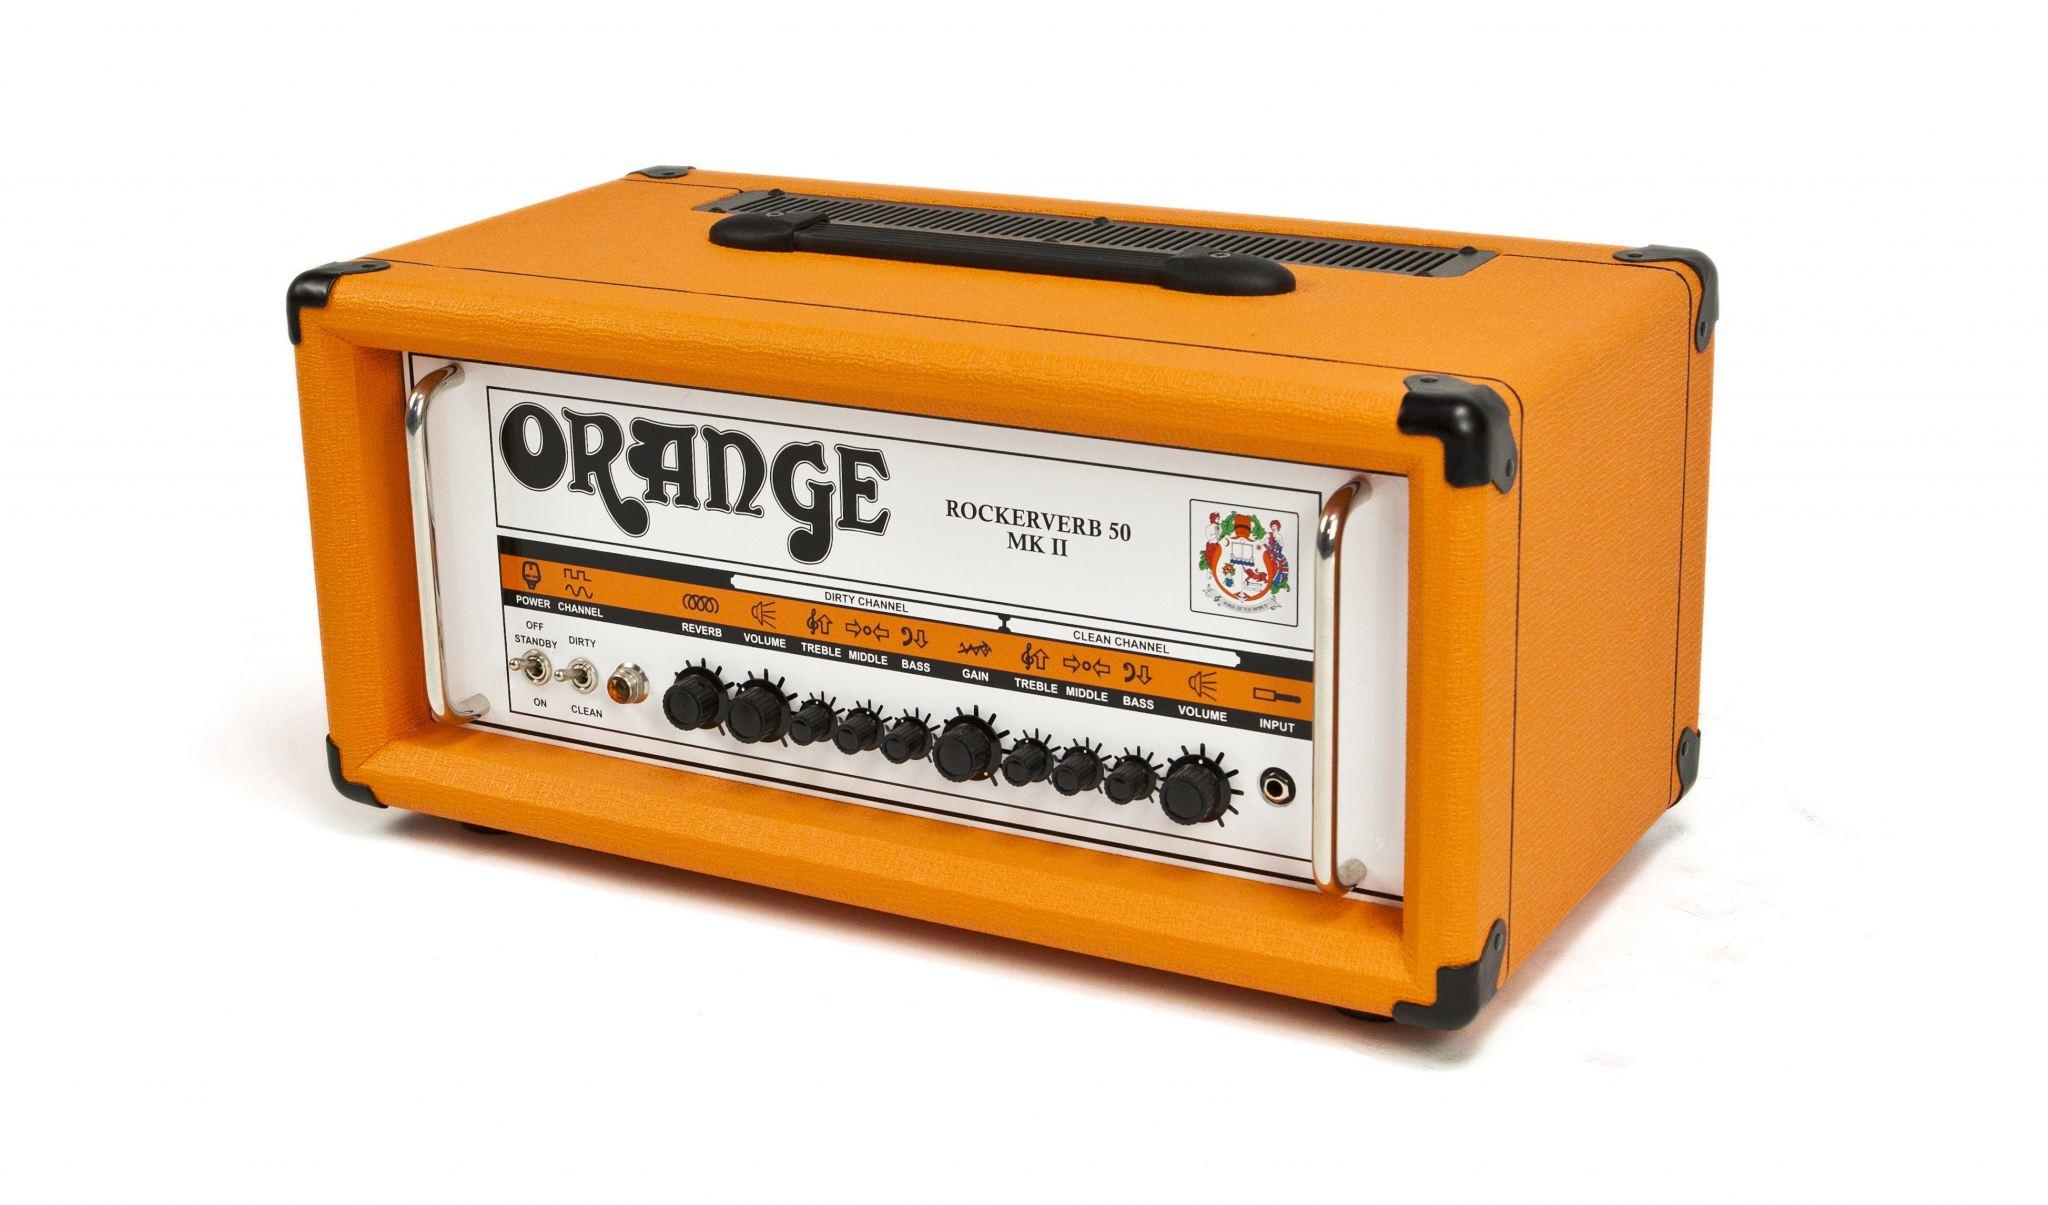 Valves For Orange Rockerverb 50 Mk11 amp head